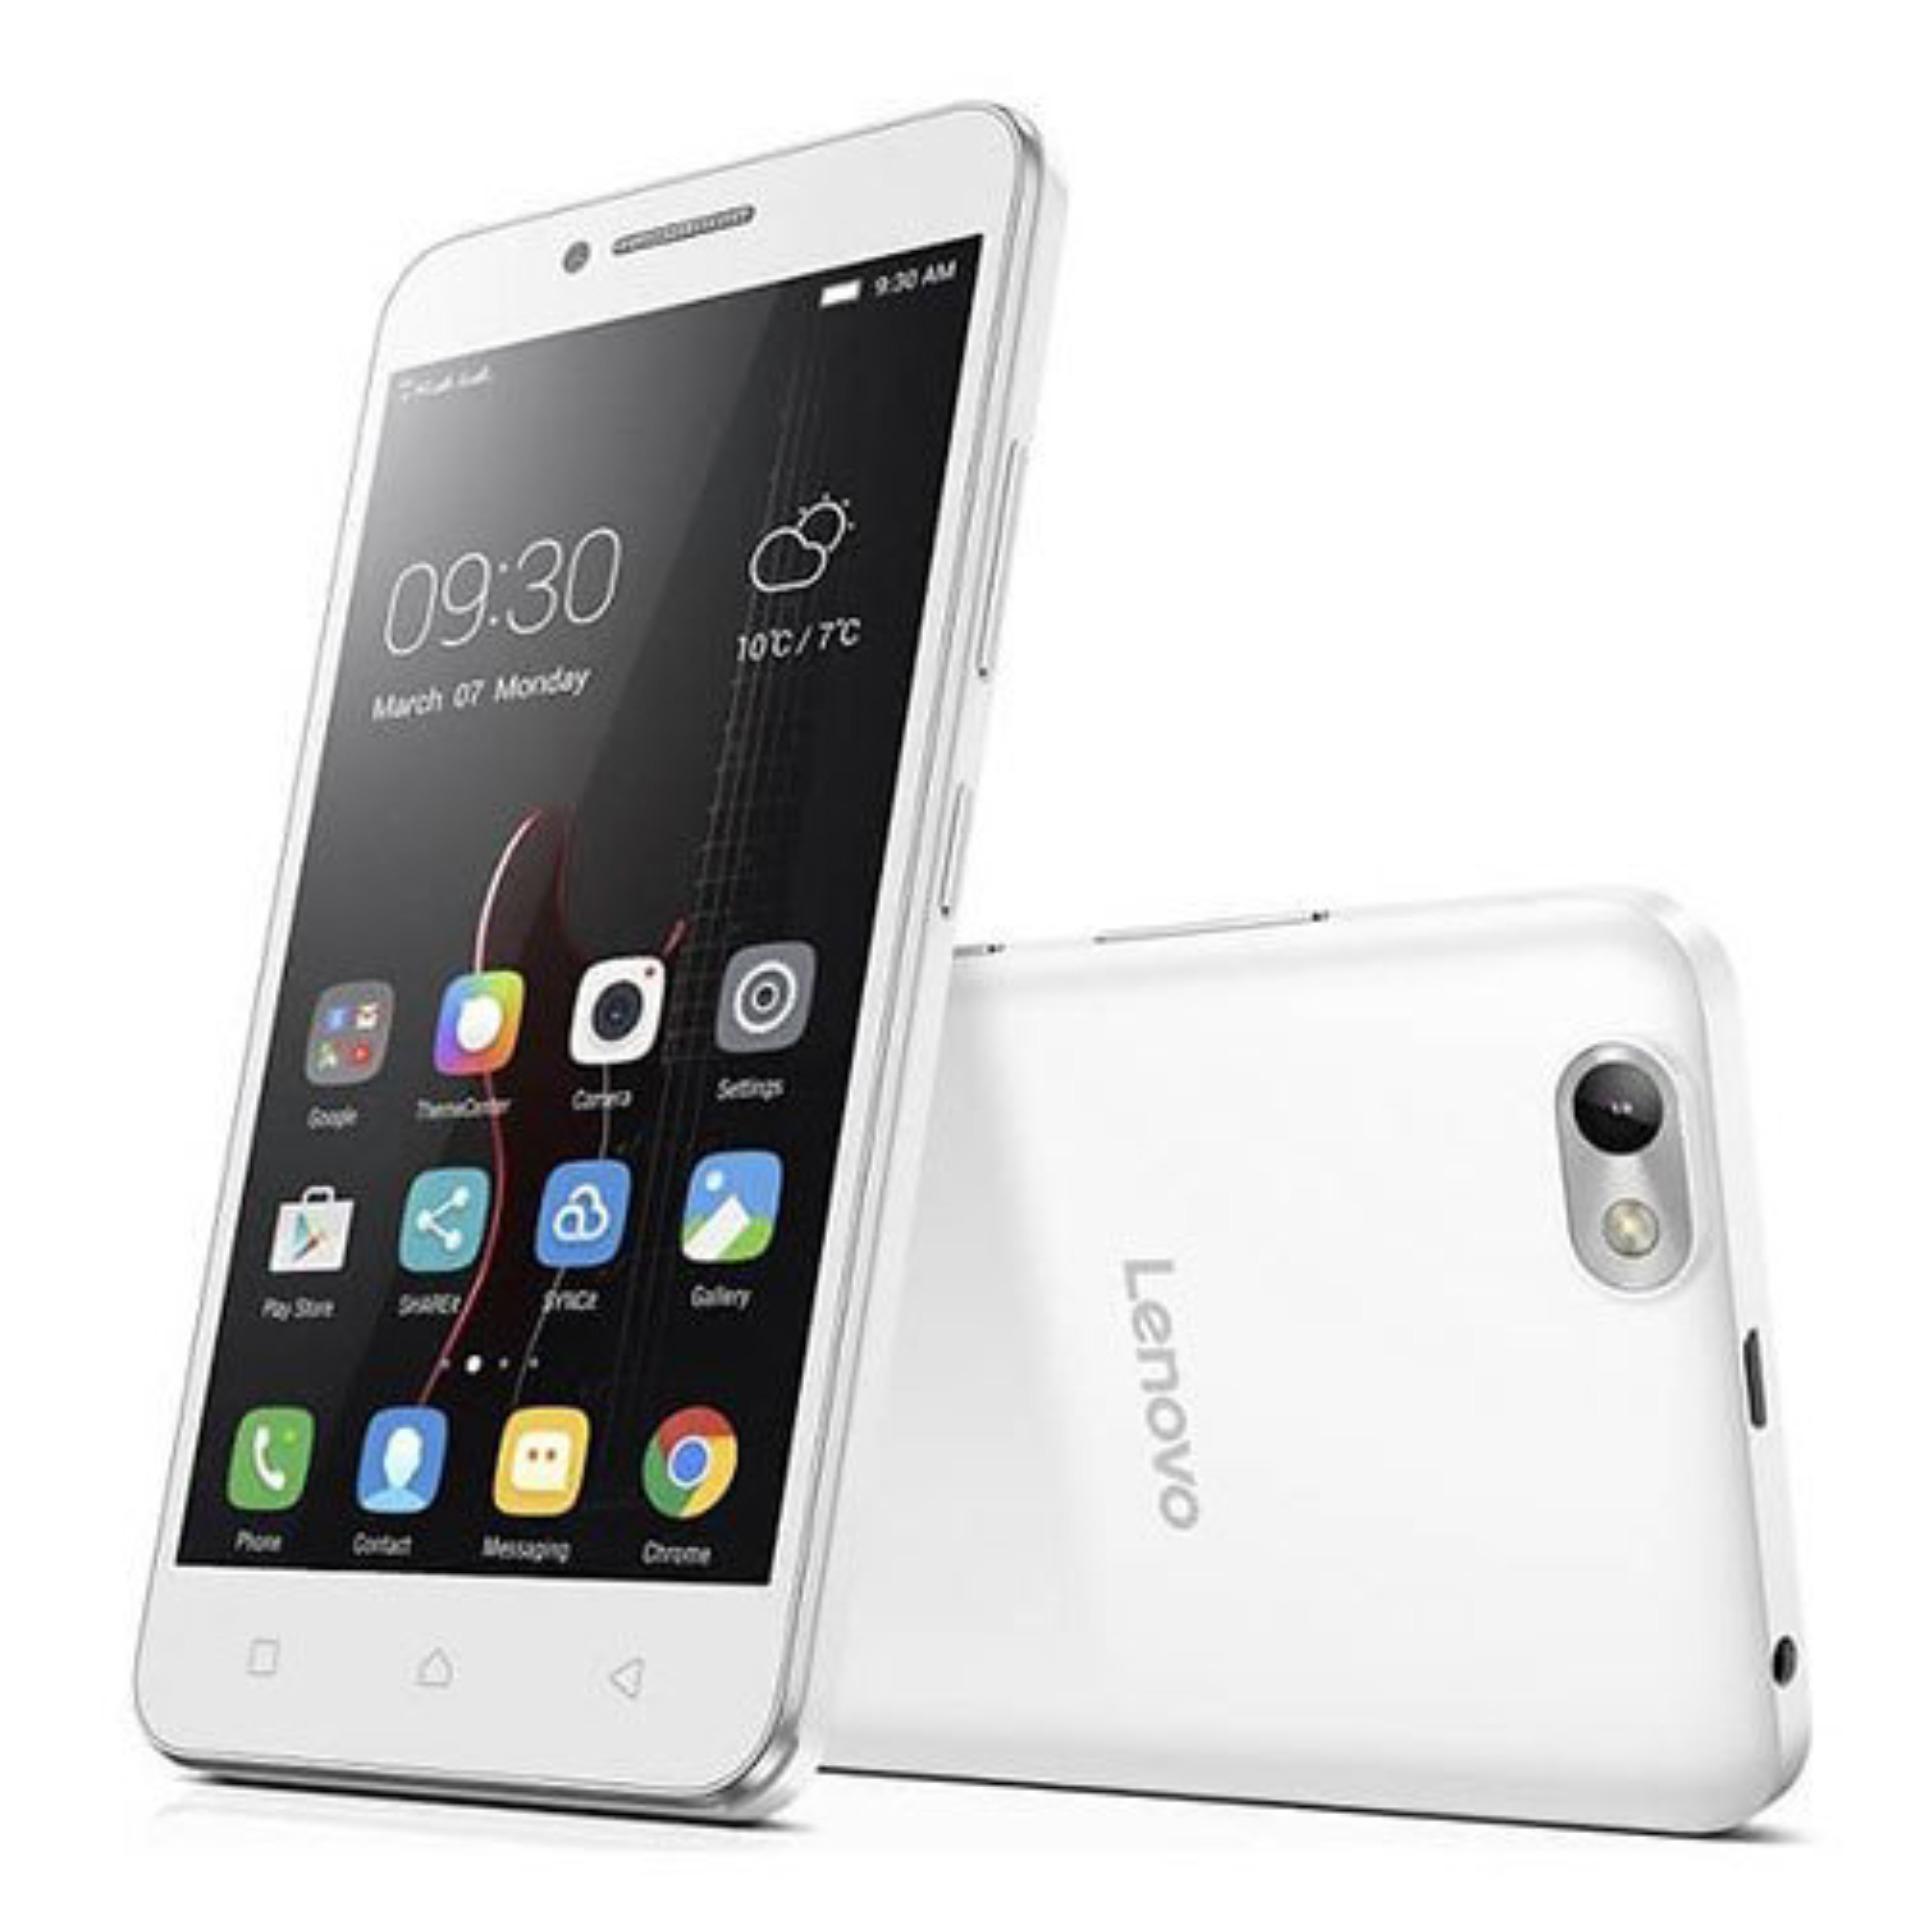 Lenovo A2020 8GB (White)